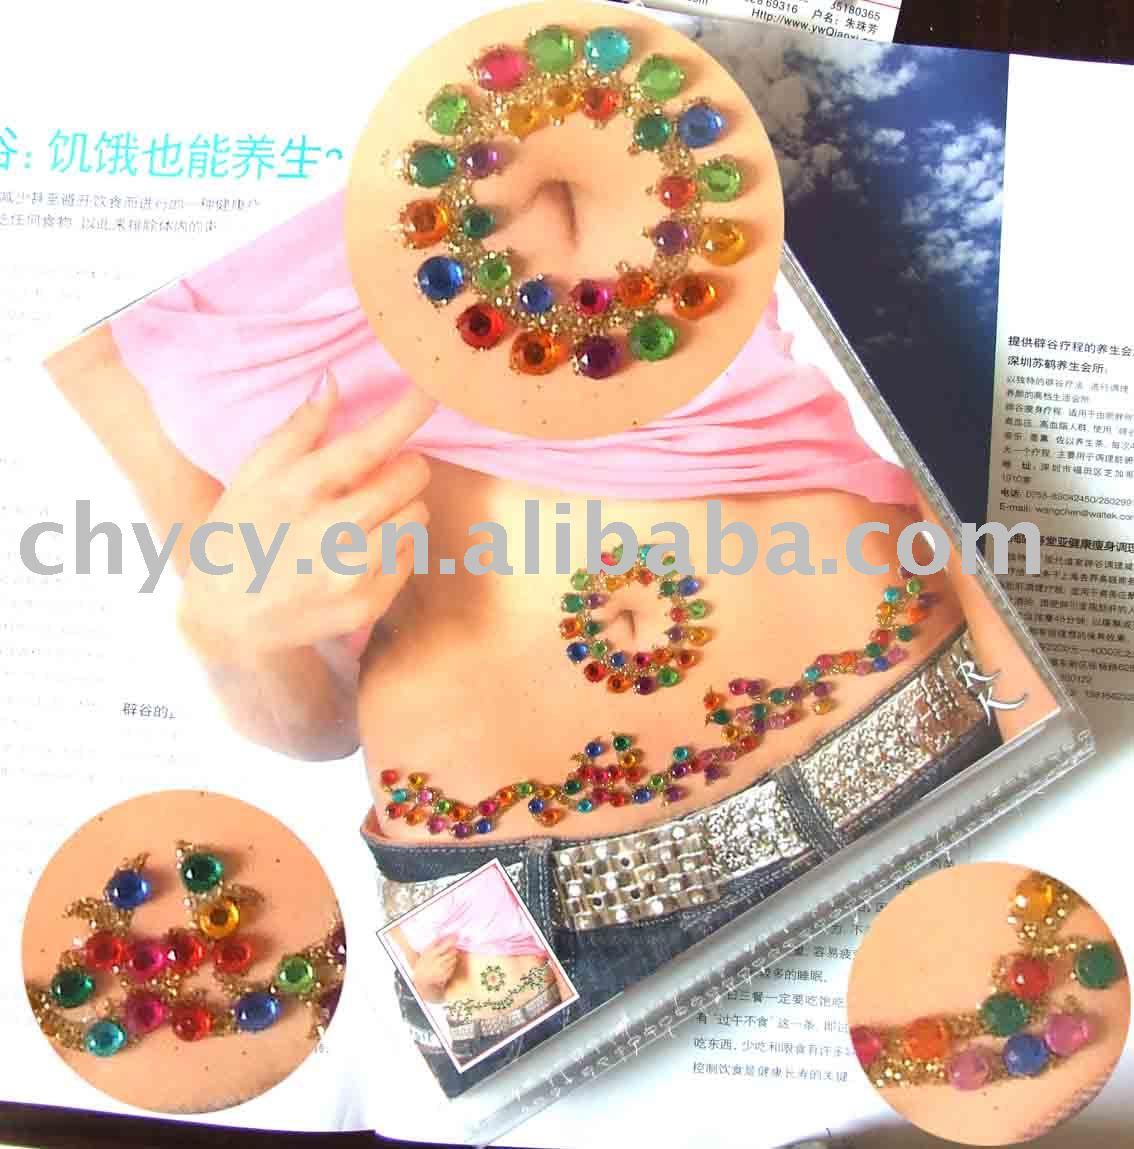 http://i01.i.aliimg.com/photo/v0/212020259/Crystal_tattoo_sticker.jpg